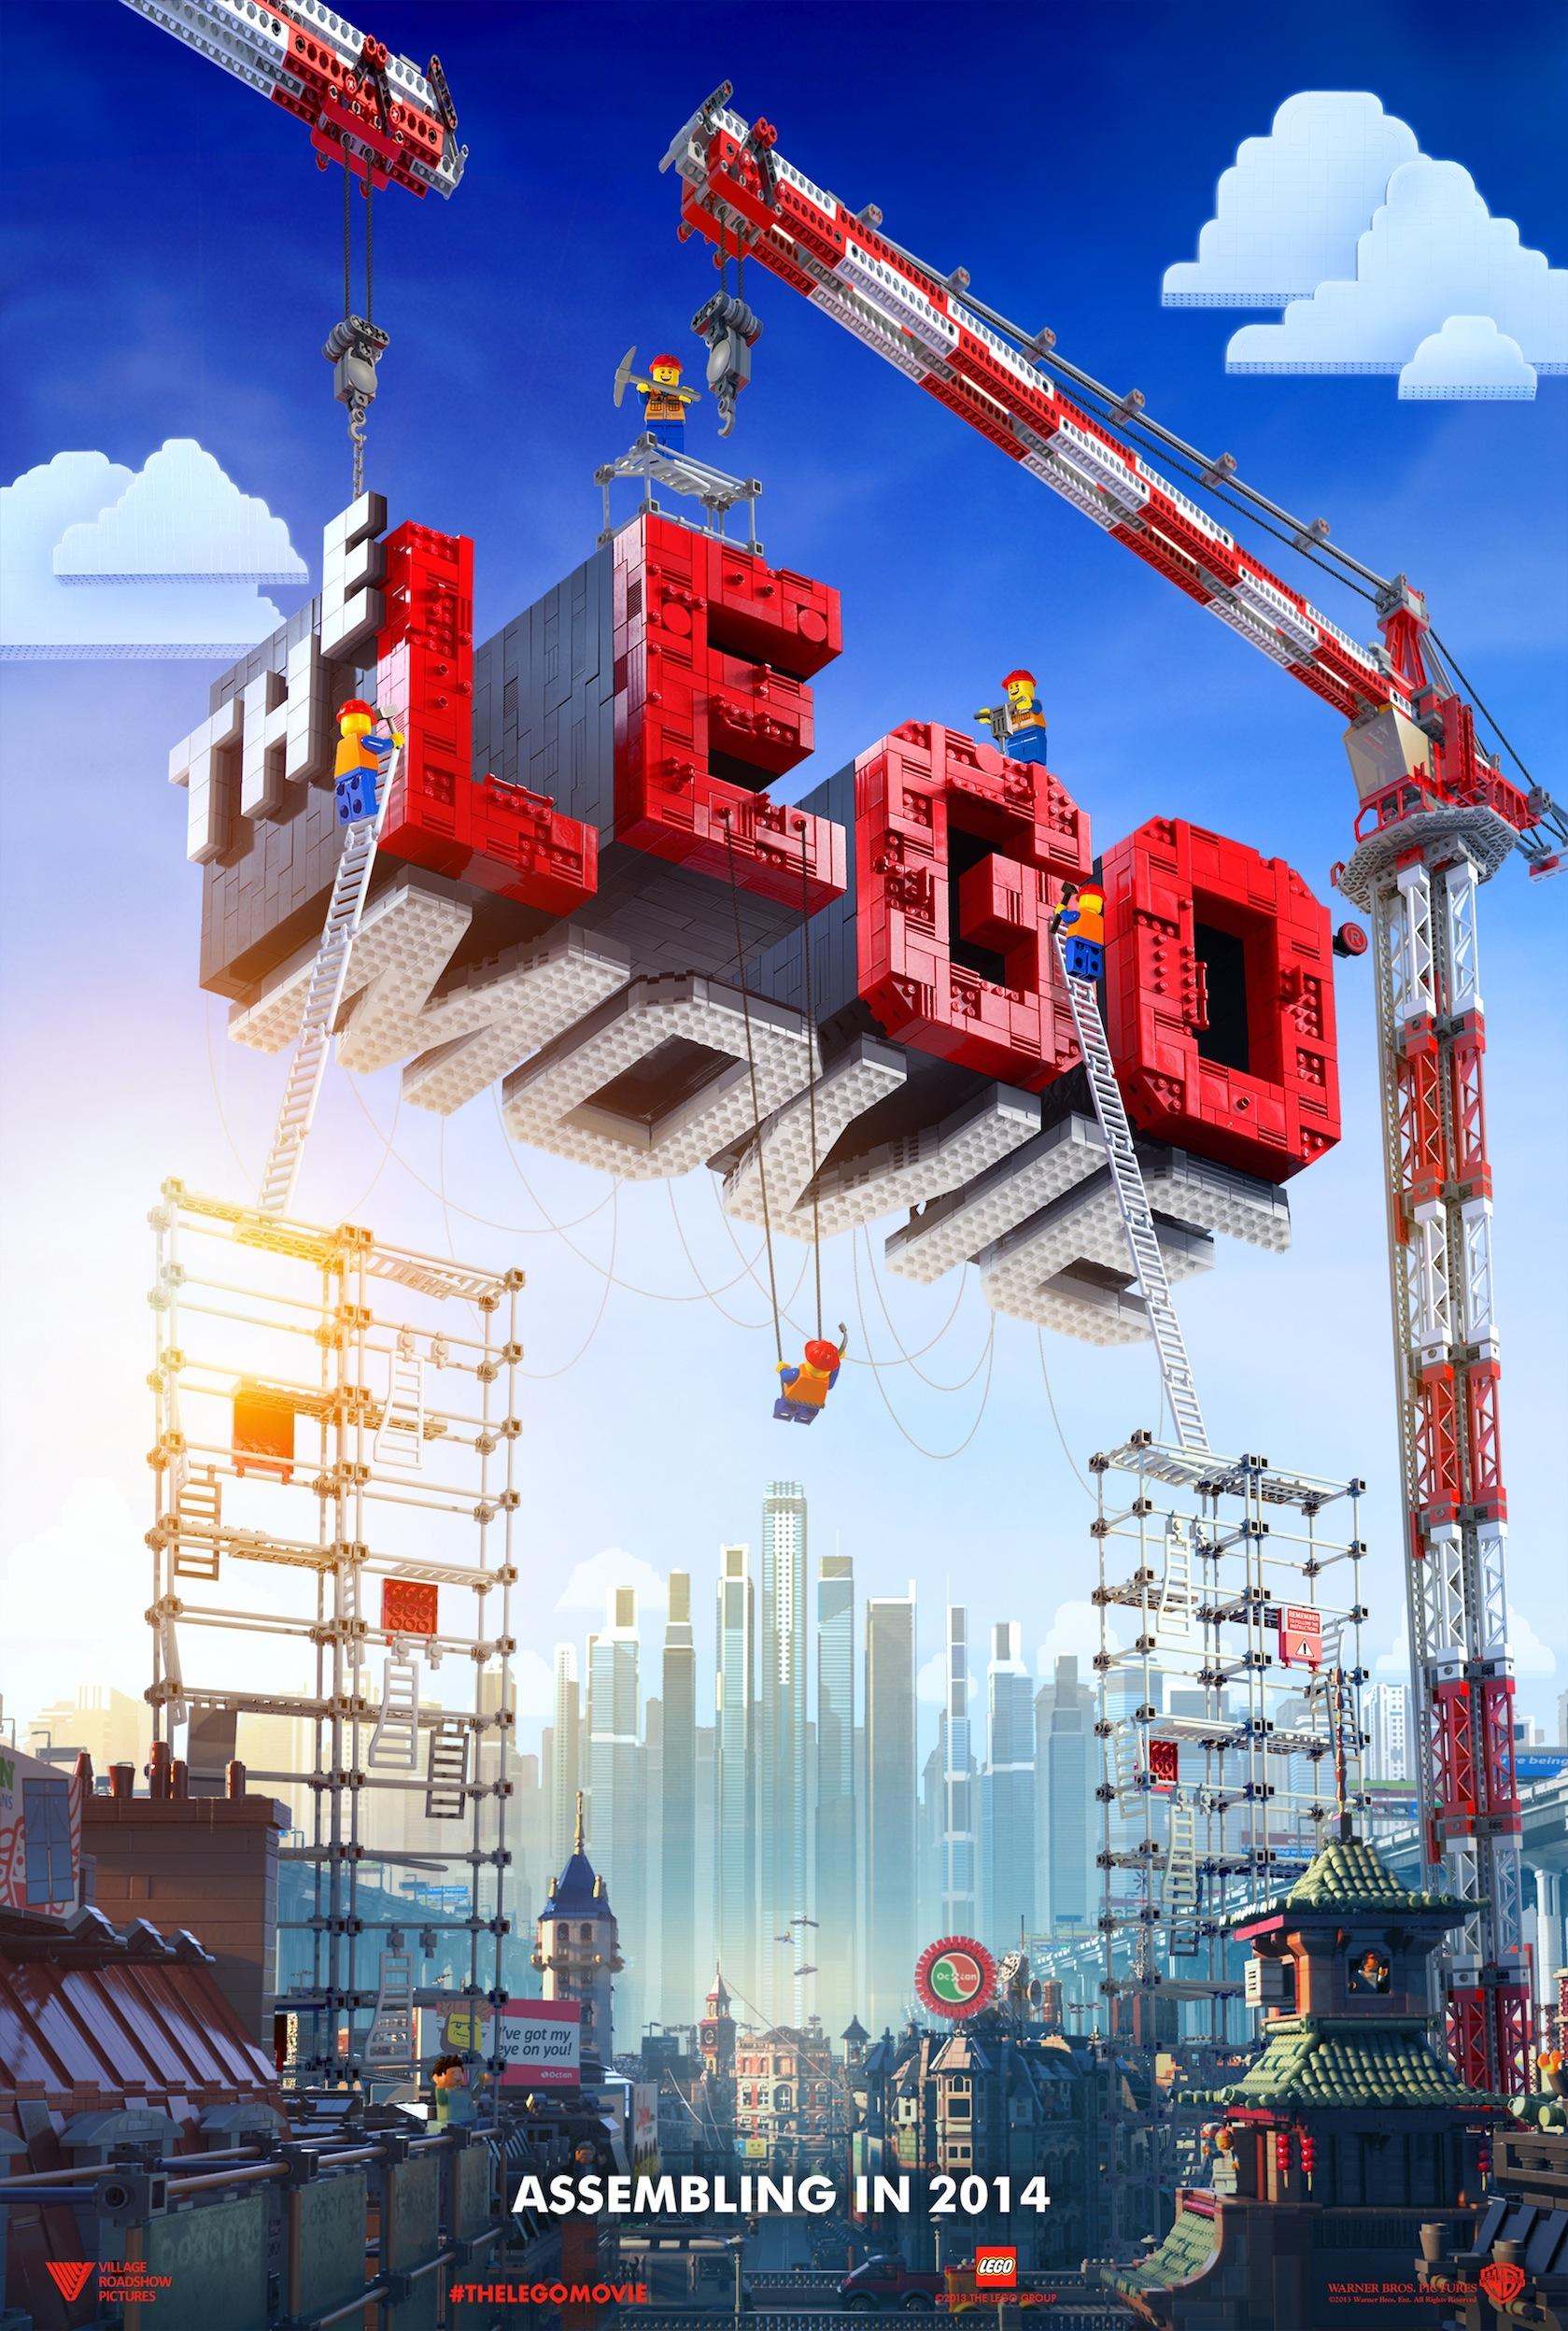 2014 LEGO Modular Building is ………